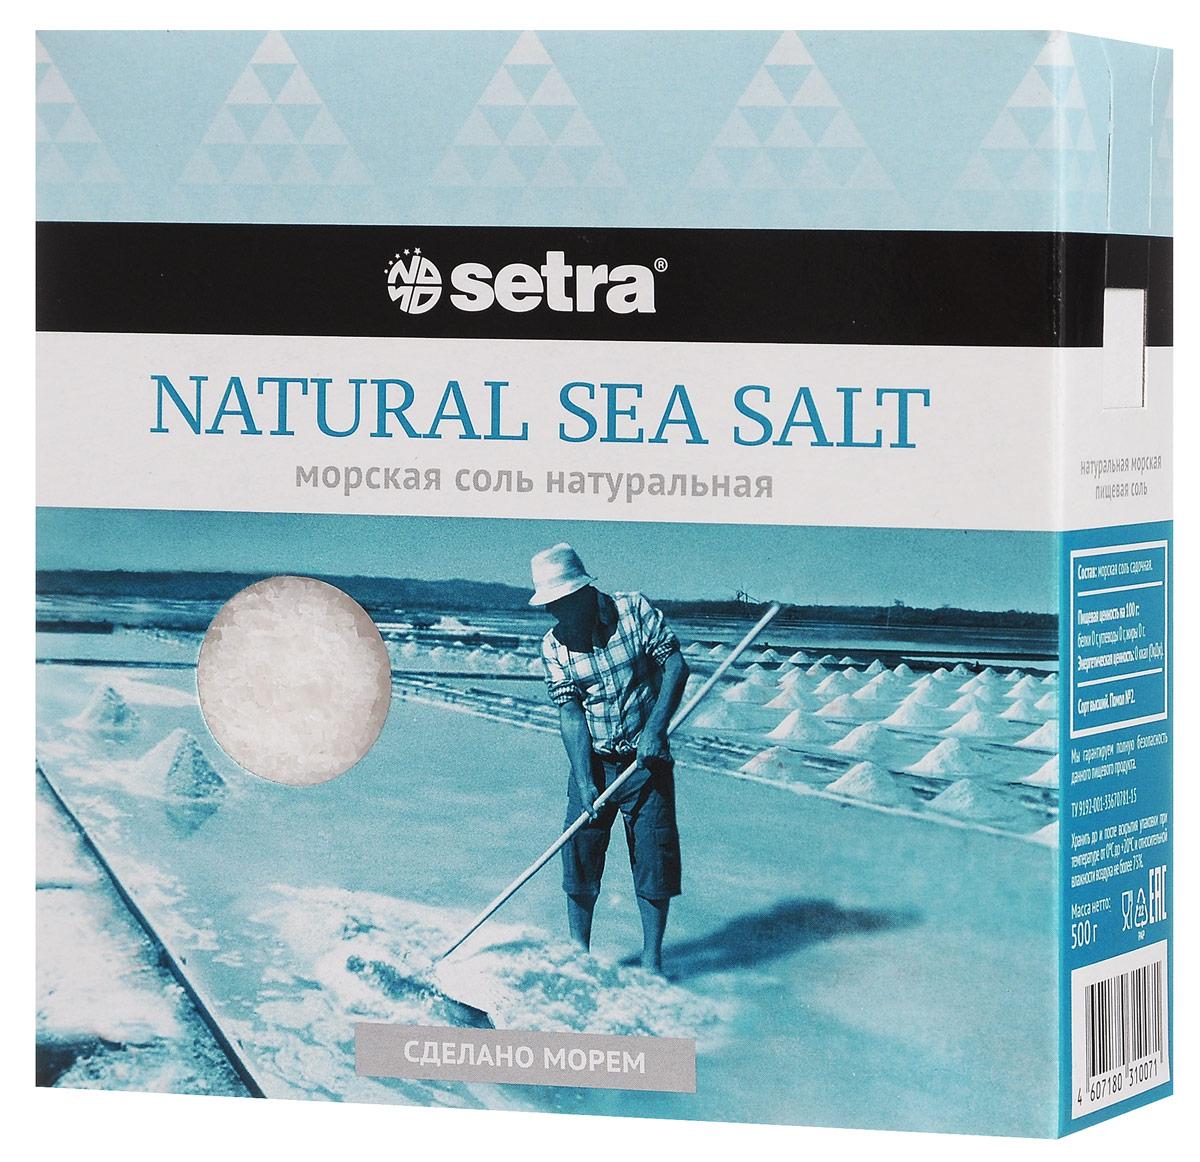 Setra соль морская натуральная без добавок, 500 г цена